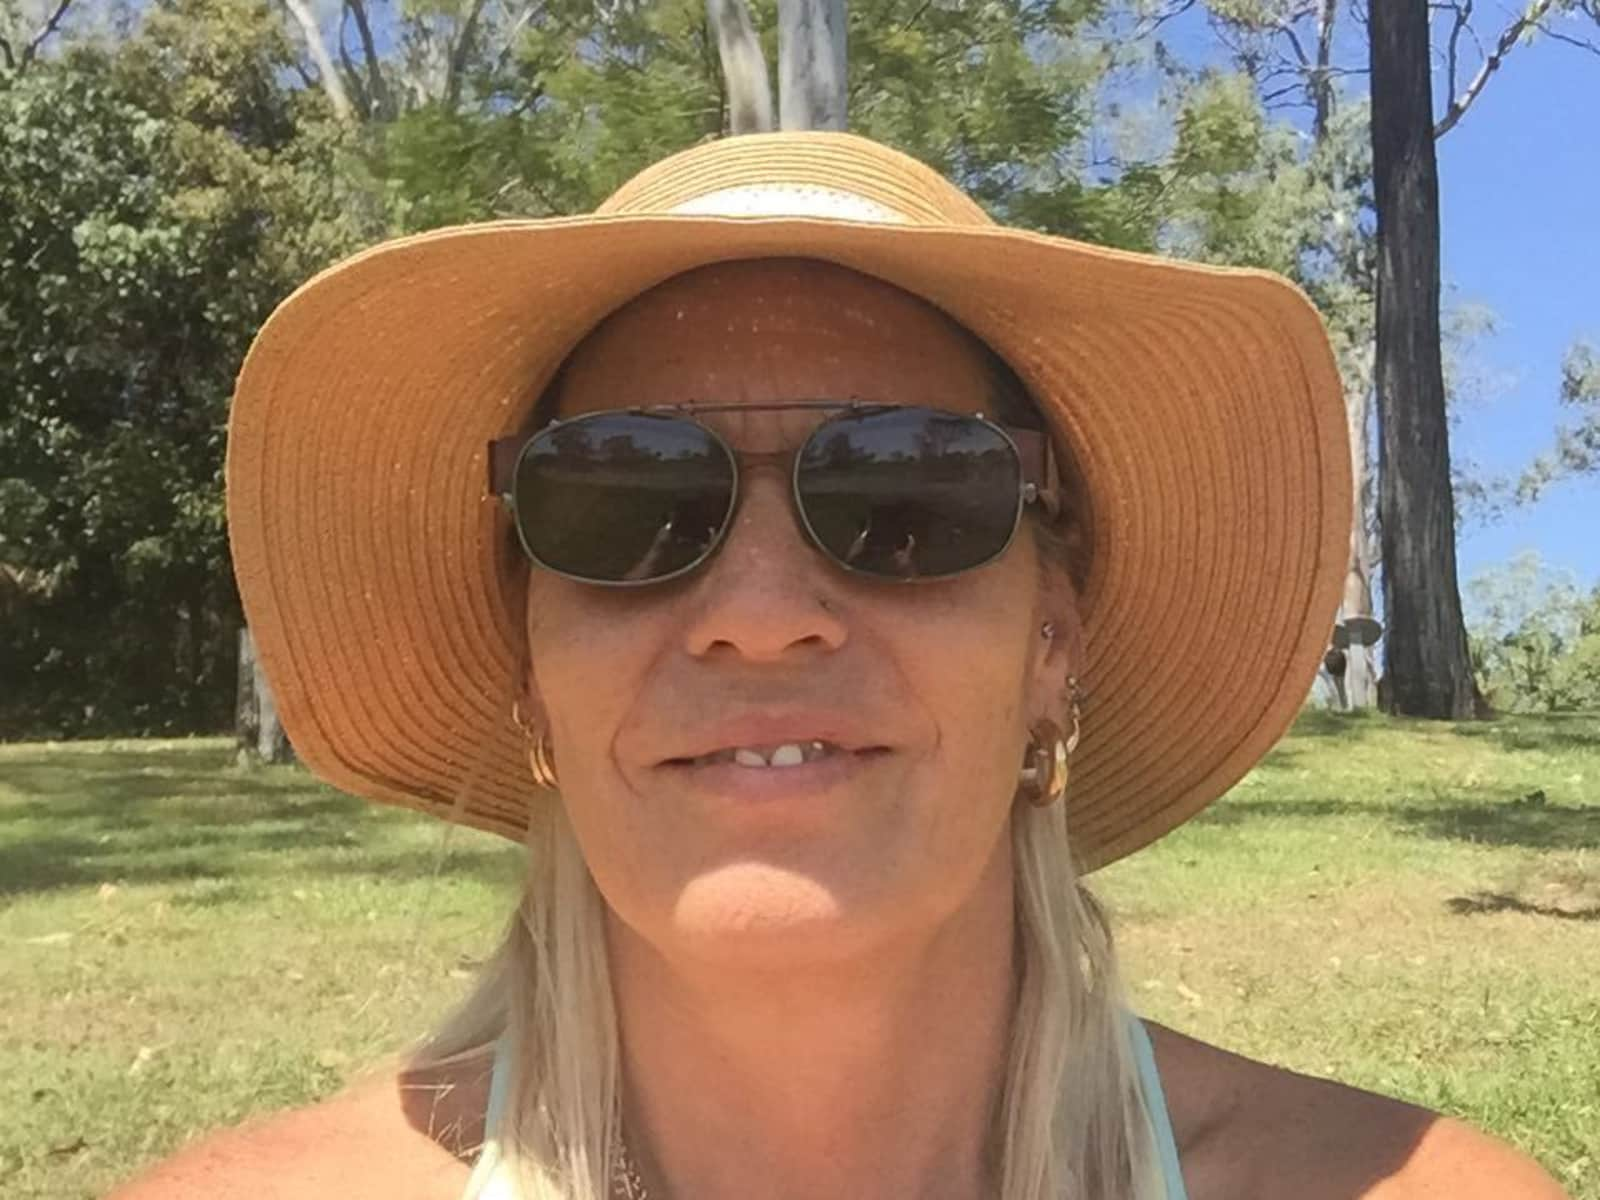 Carol from Townsville, Queensland, Australia